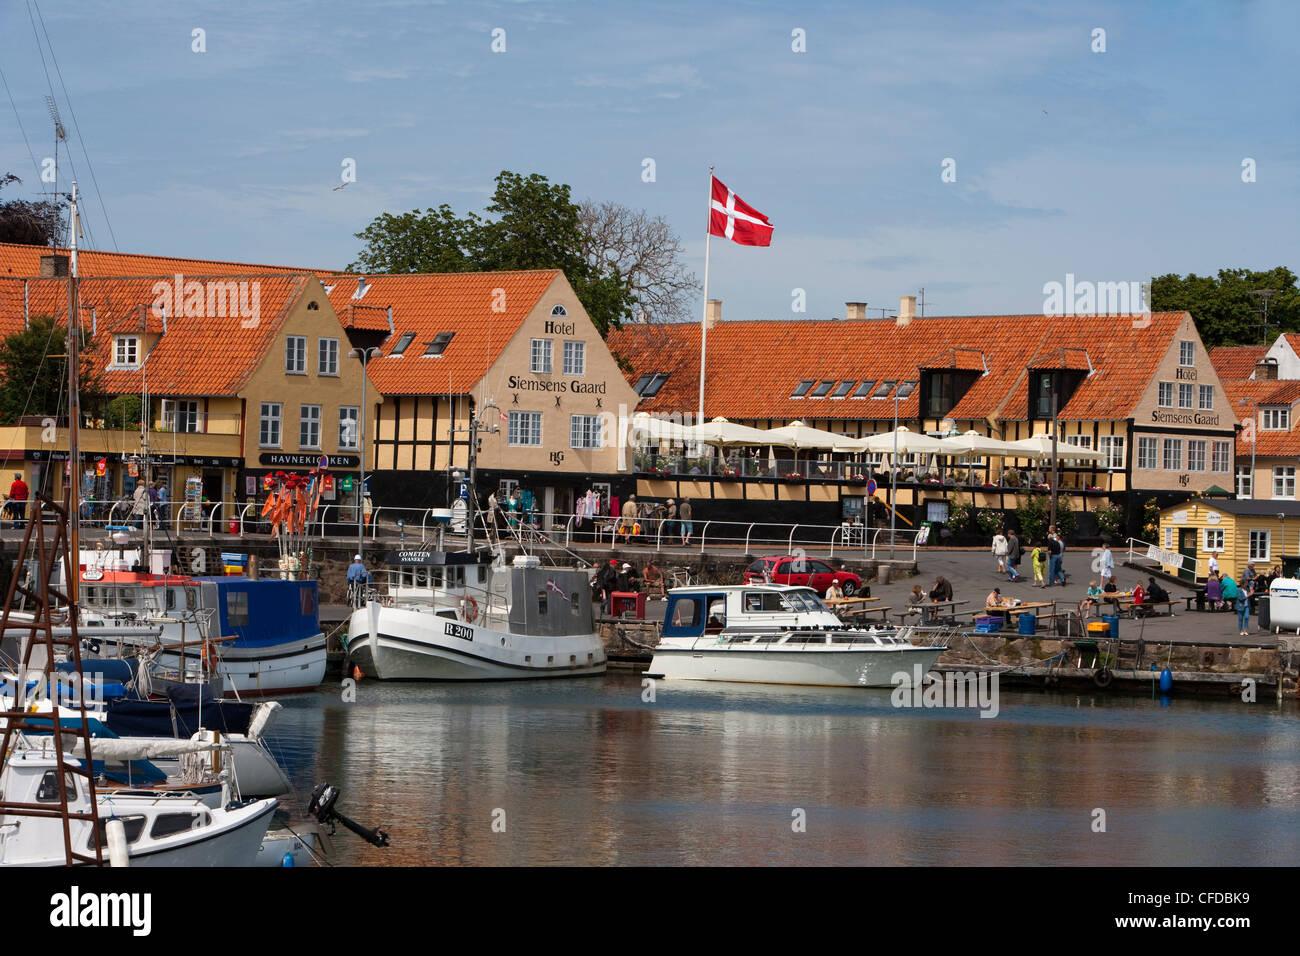 Harbour and Hotel Siemsens Gaard, Svaneke, Bornholm, Denmark - Stock Image